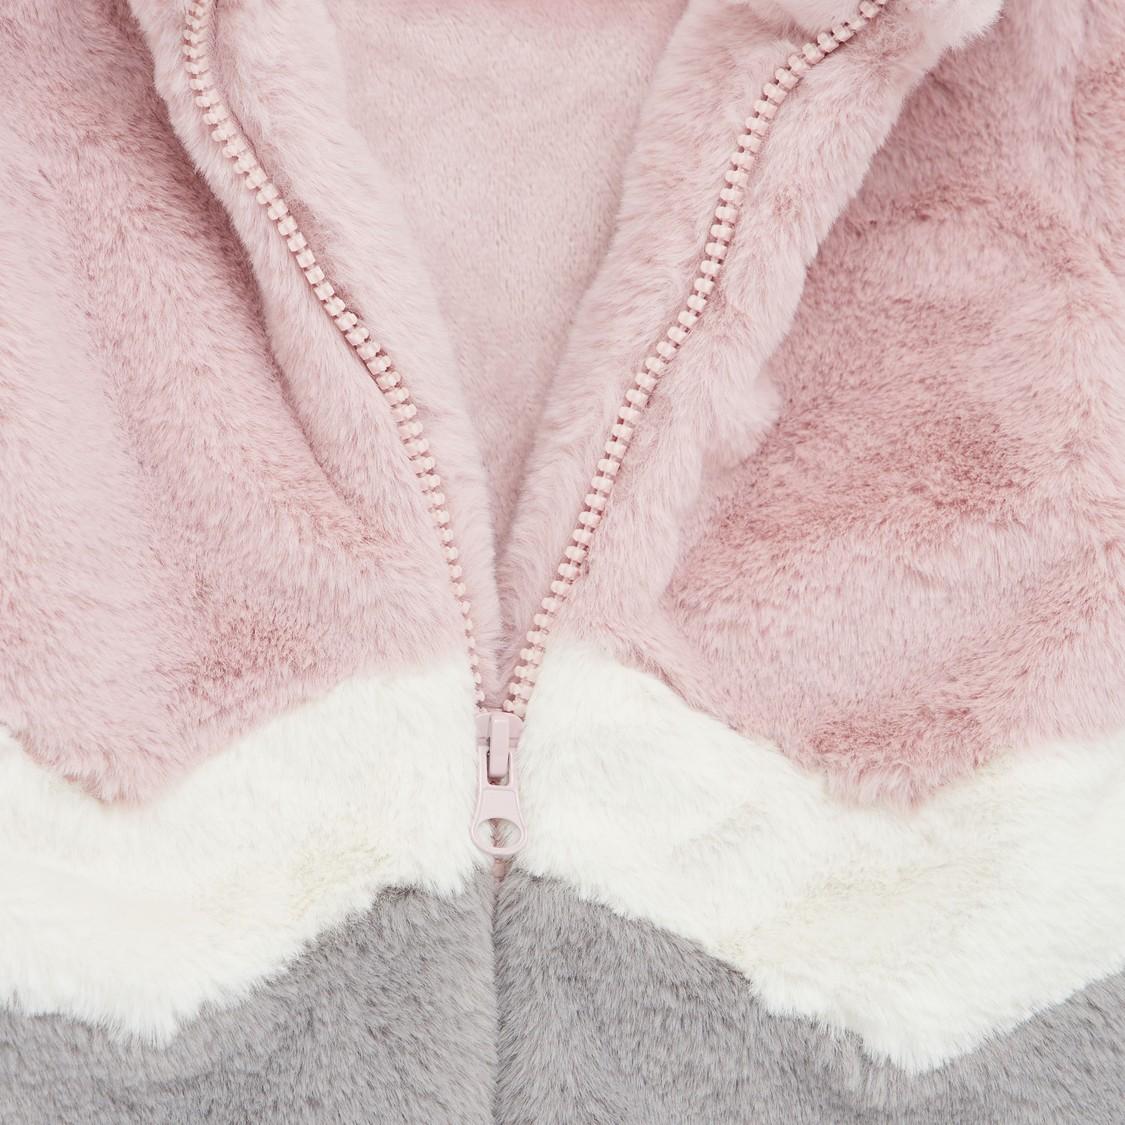 Colourblock Fur Coat with Long Sleeves and Zip Closure